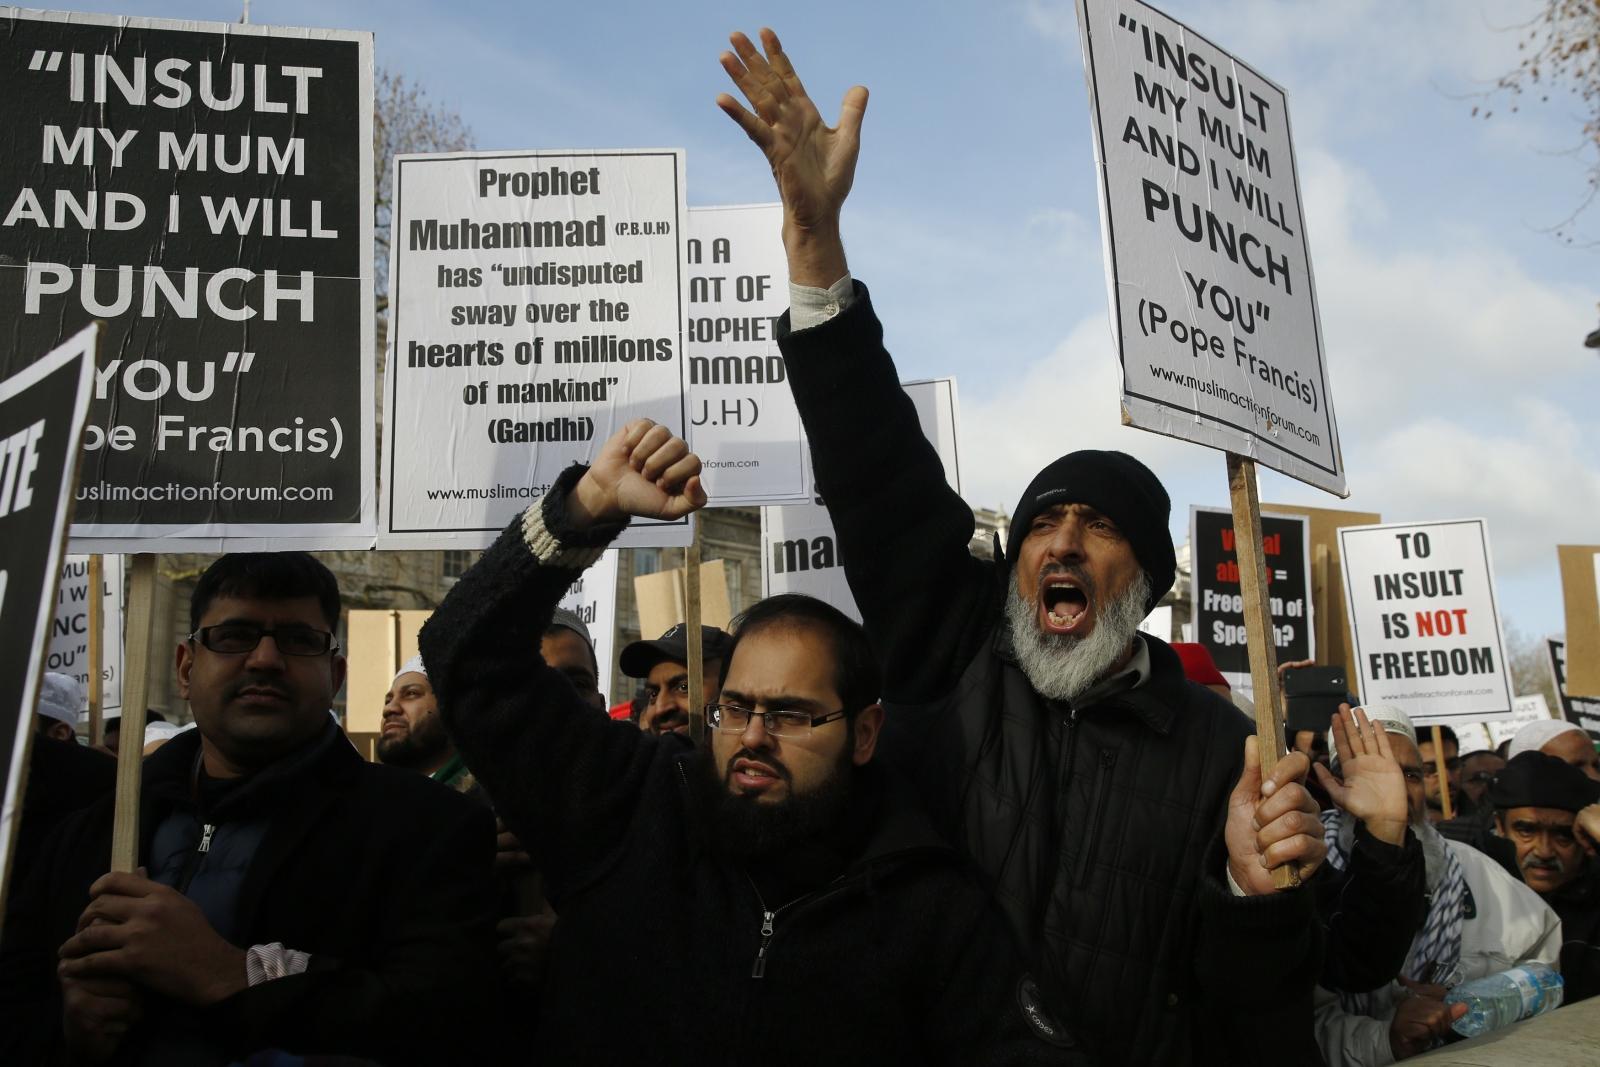 Uk muslims press for peace at 10 downing street - Muslims Converge On Downing Street To Protest Against Charlie Hebdo Mohammed Cartoons